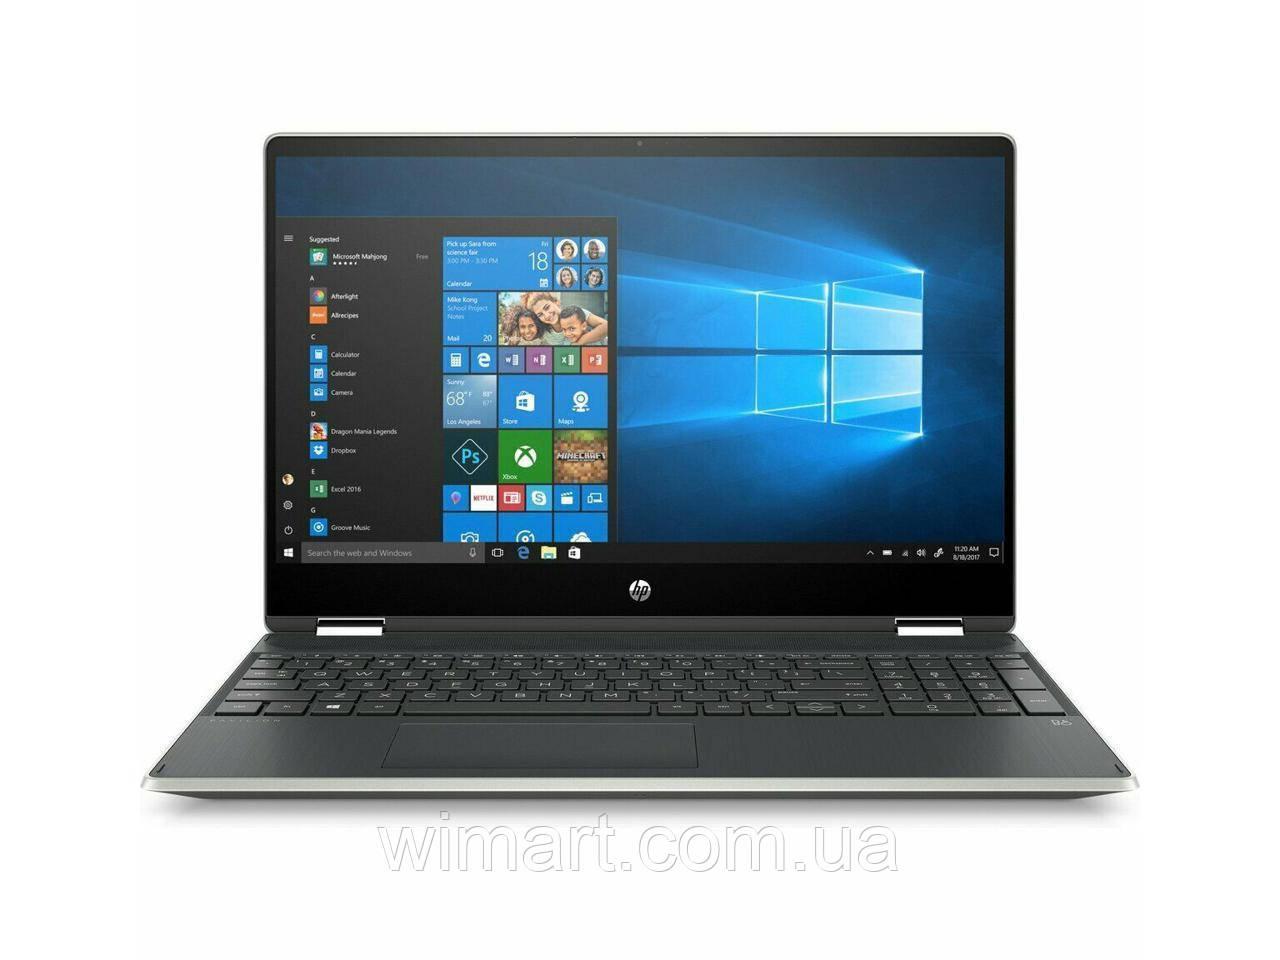 HP PAVILION X360 CONVERTIBLE 15-ER0097NR (3F1G0UA)